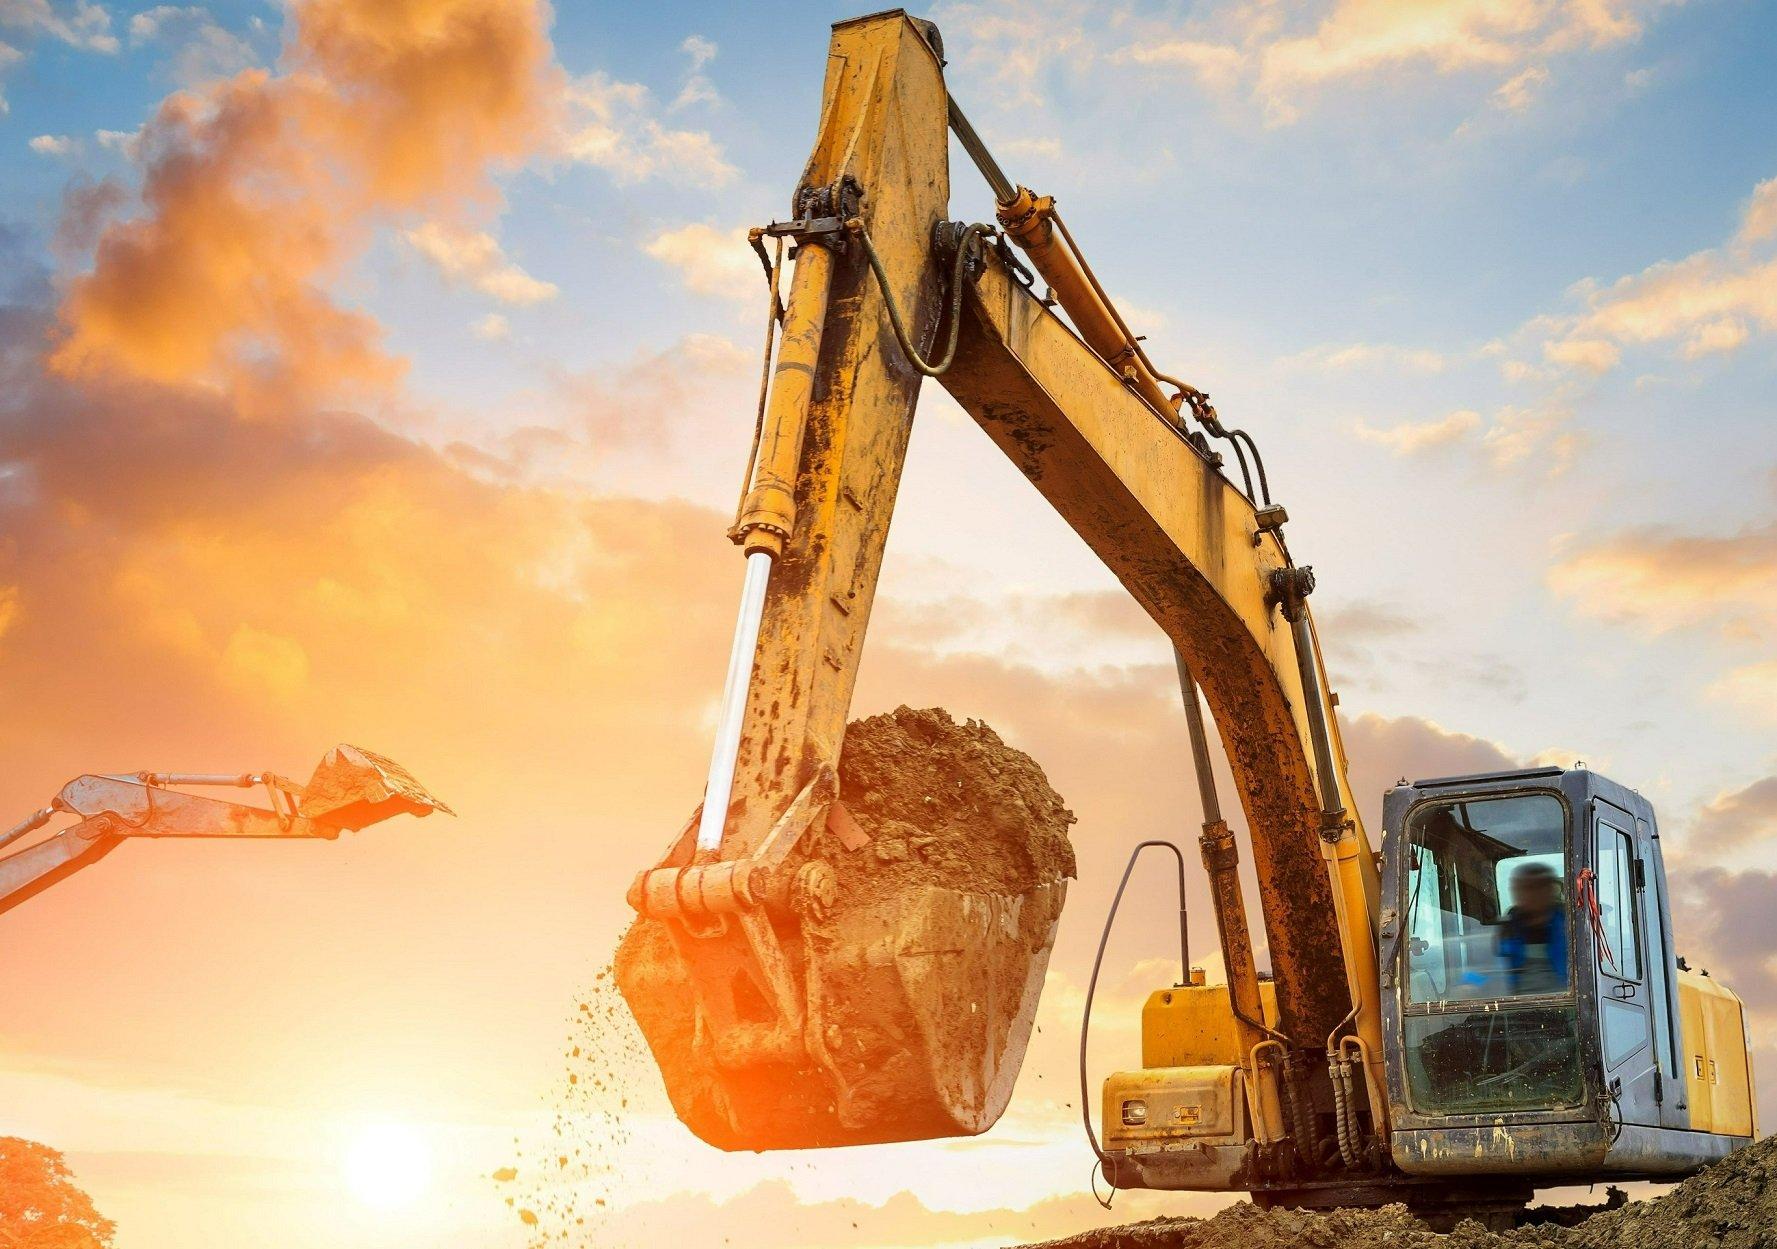 2021 Marcum National Construction Survey